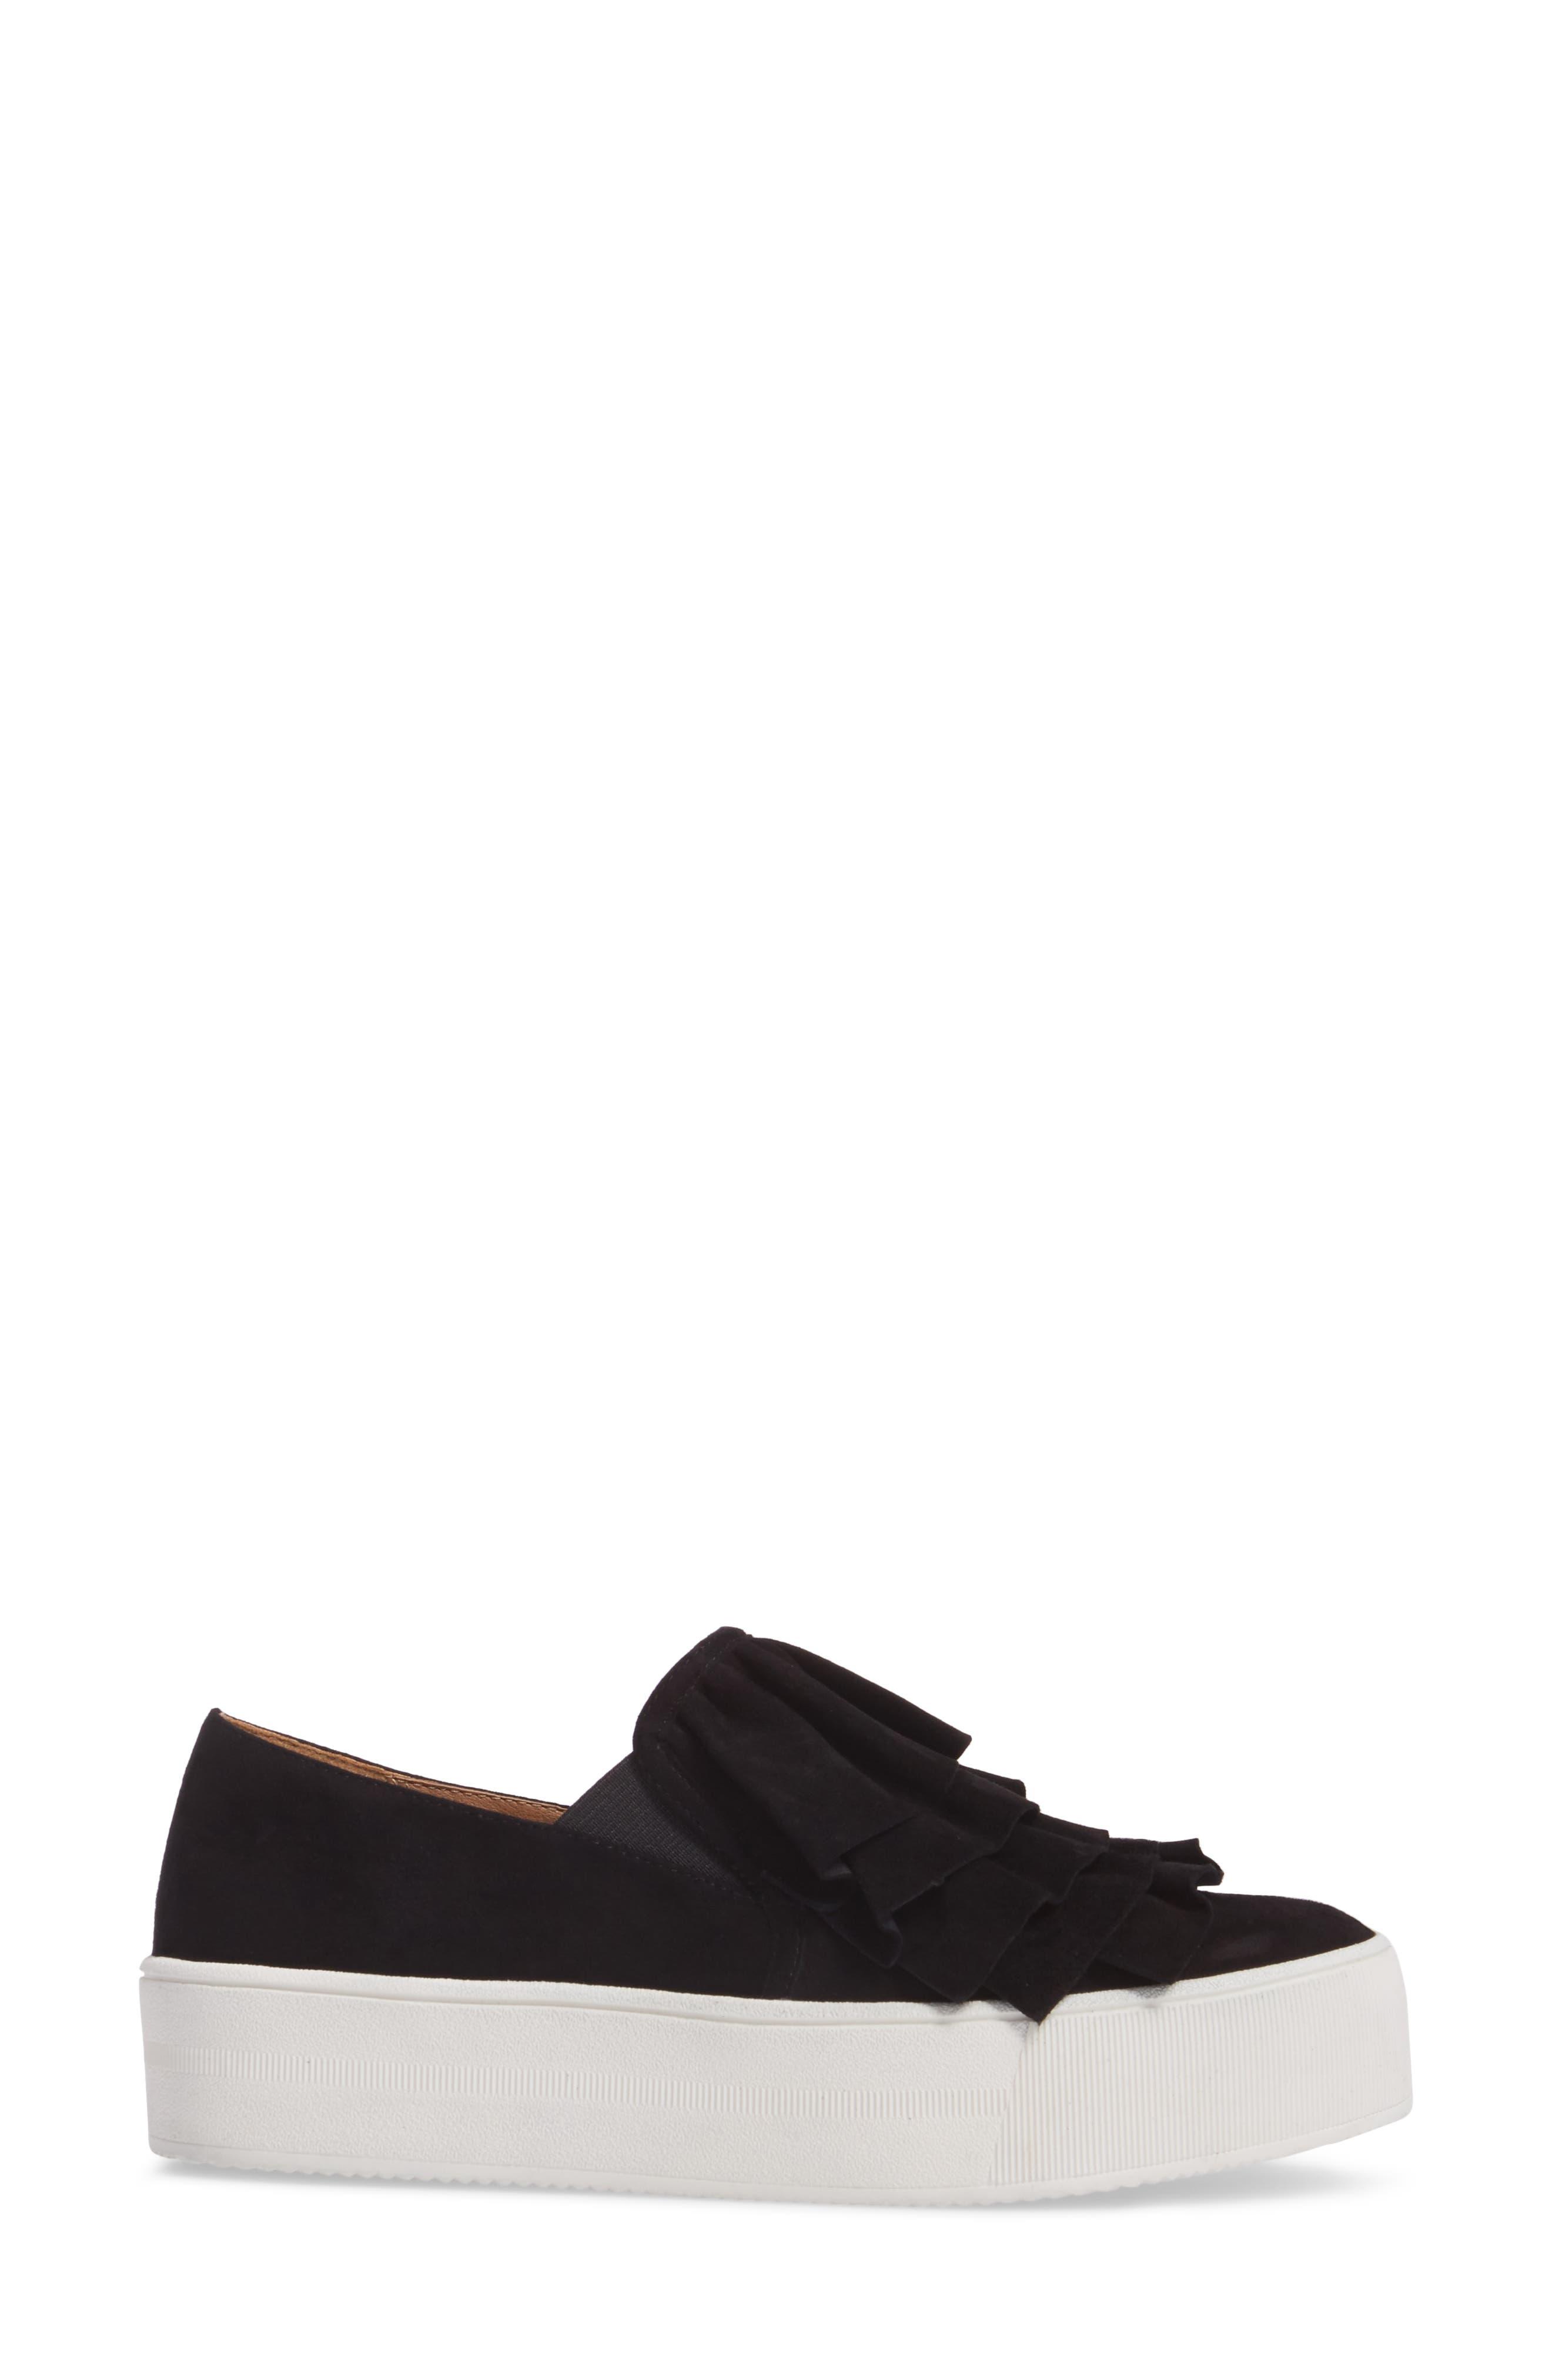 Marian Platform Sneaker,                             Alternate thumbnail 3, color,                             001